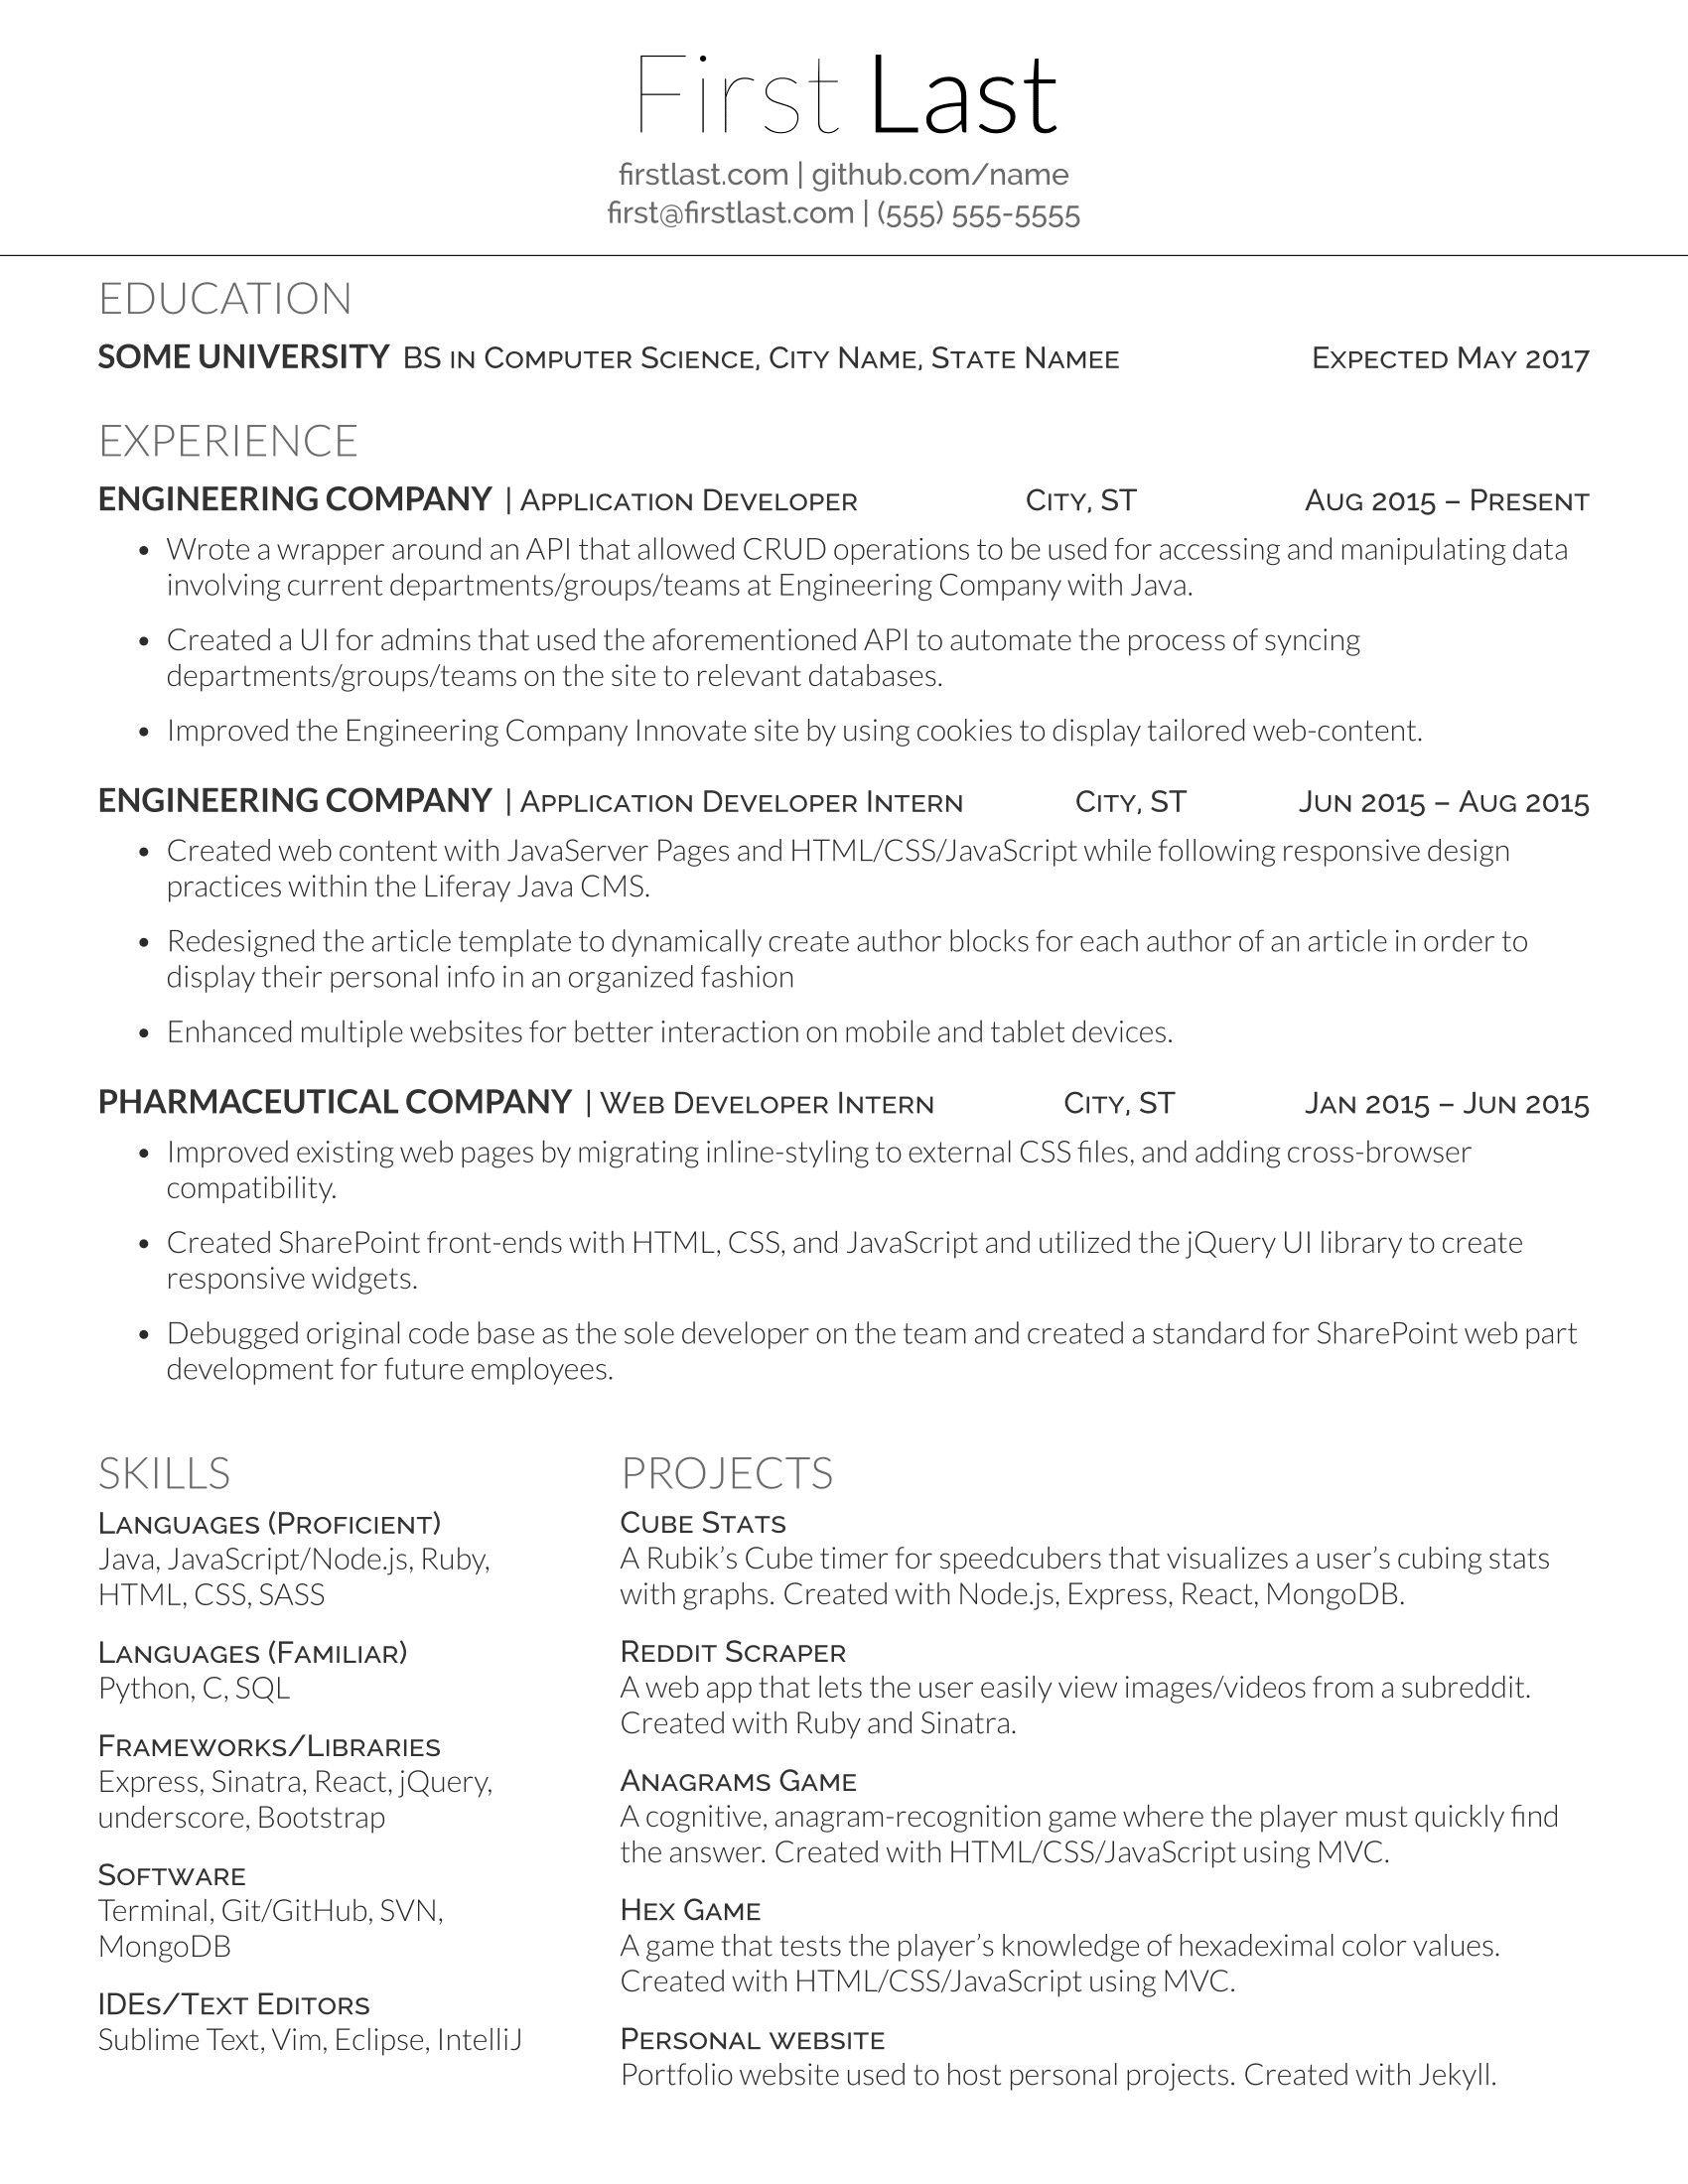 Resume Format Reddit Resume Templates